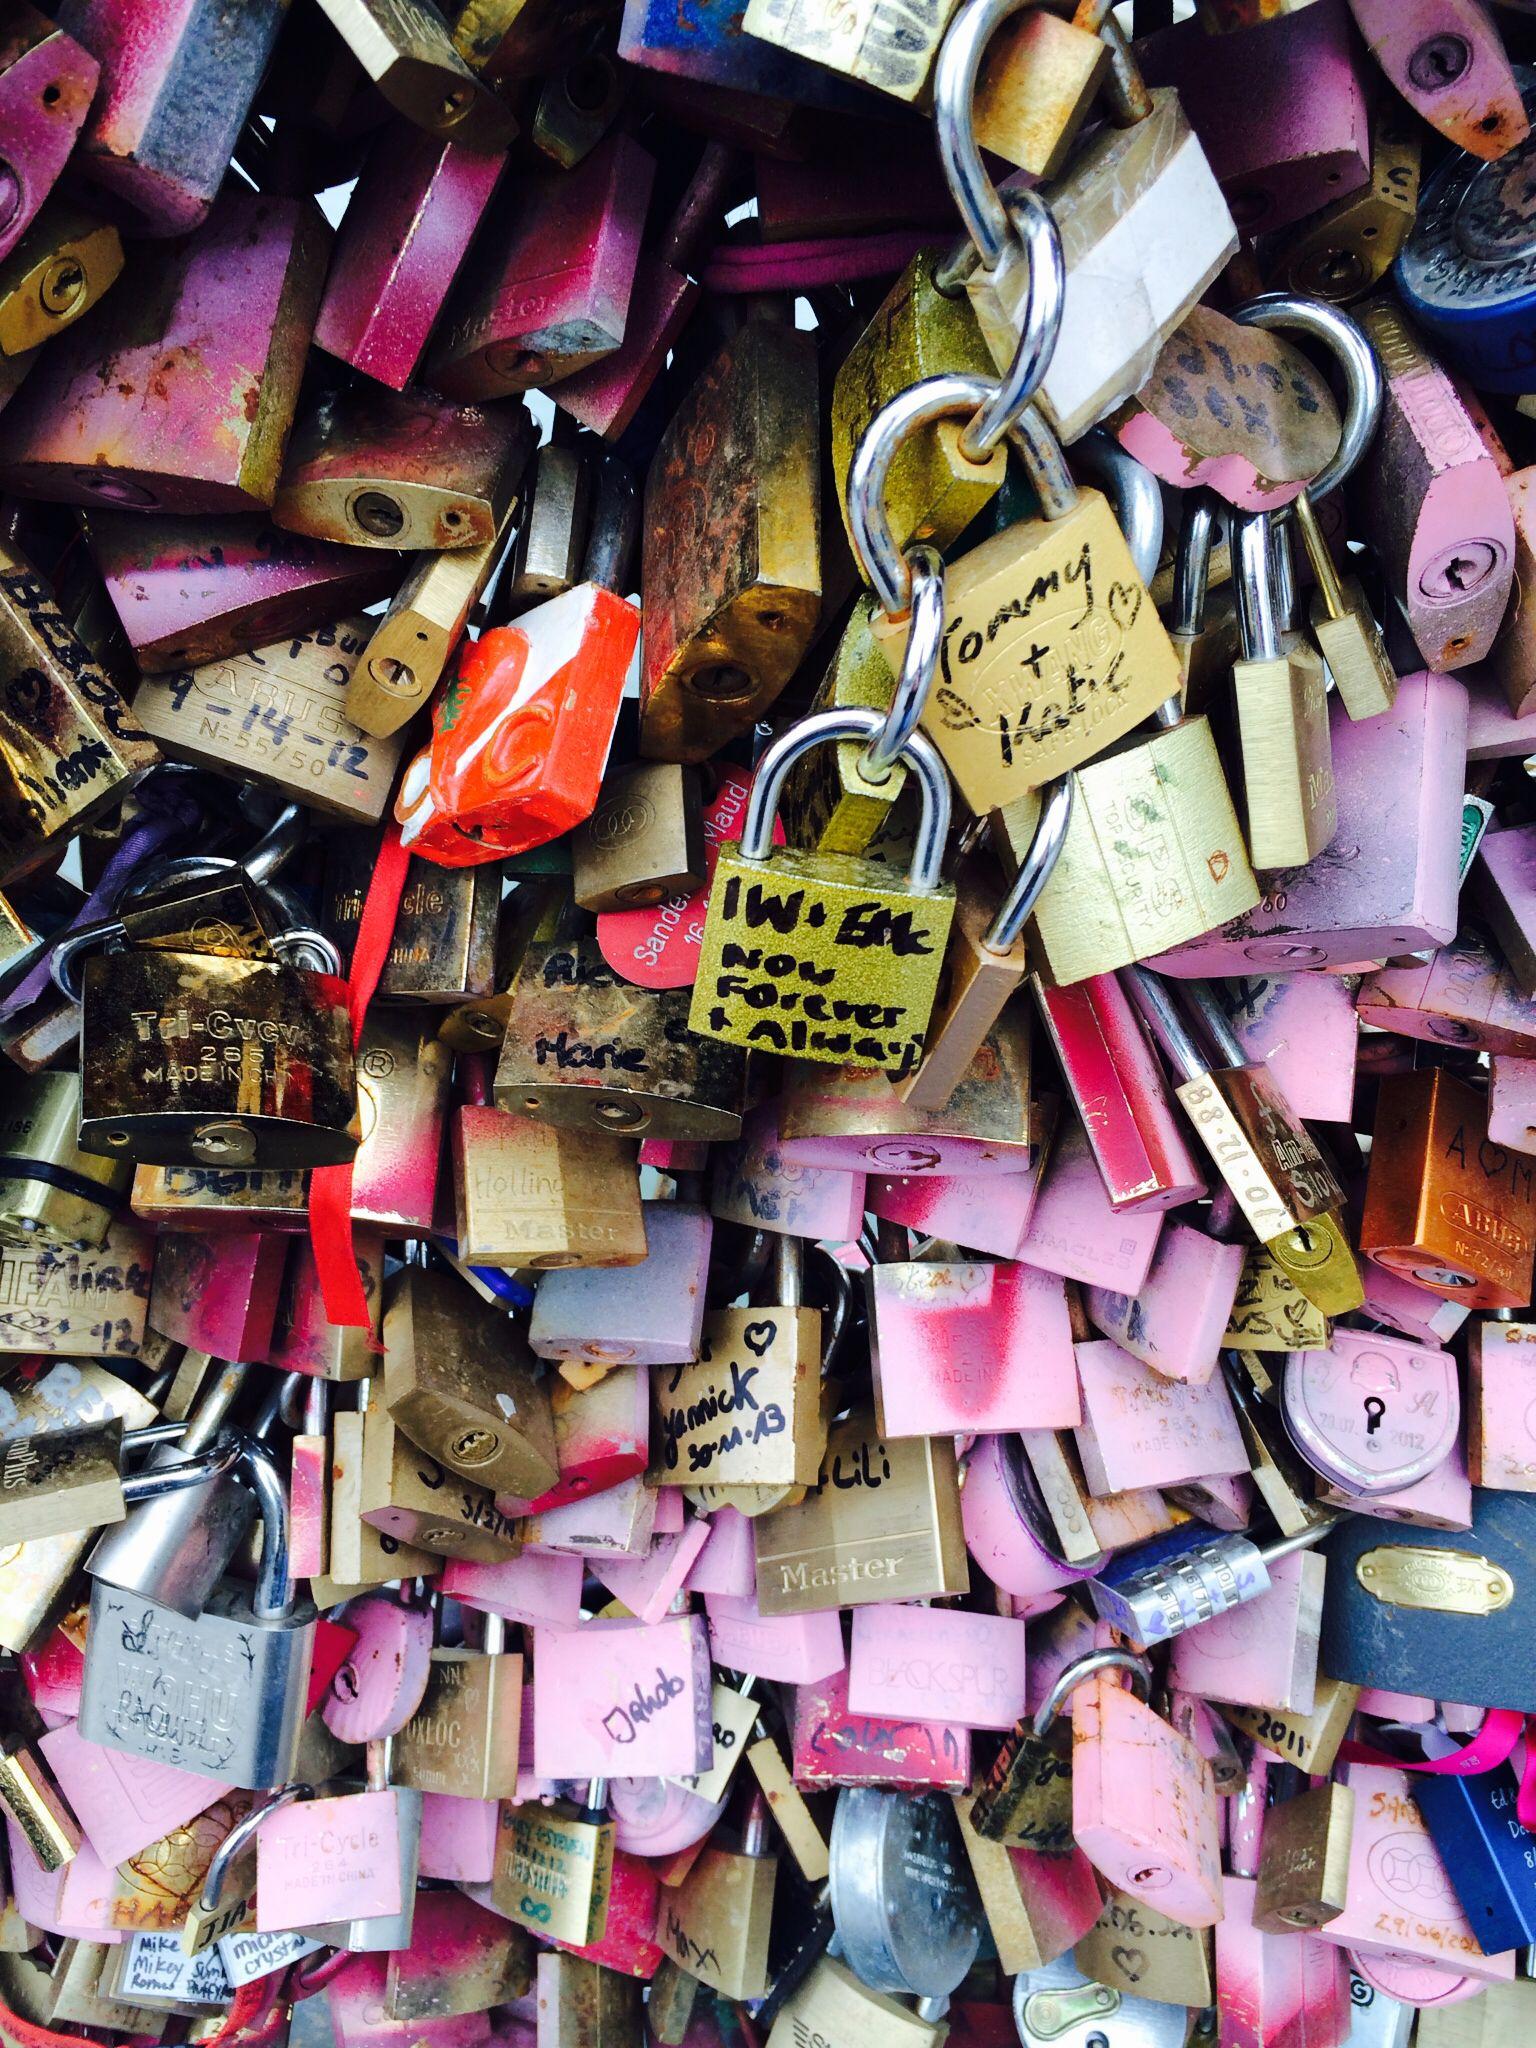 Lovelock Bridge Paris - Ben & I added our lock today x